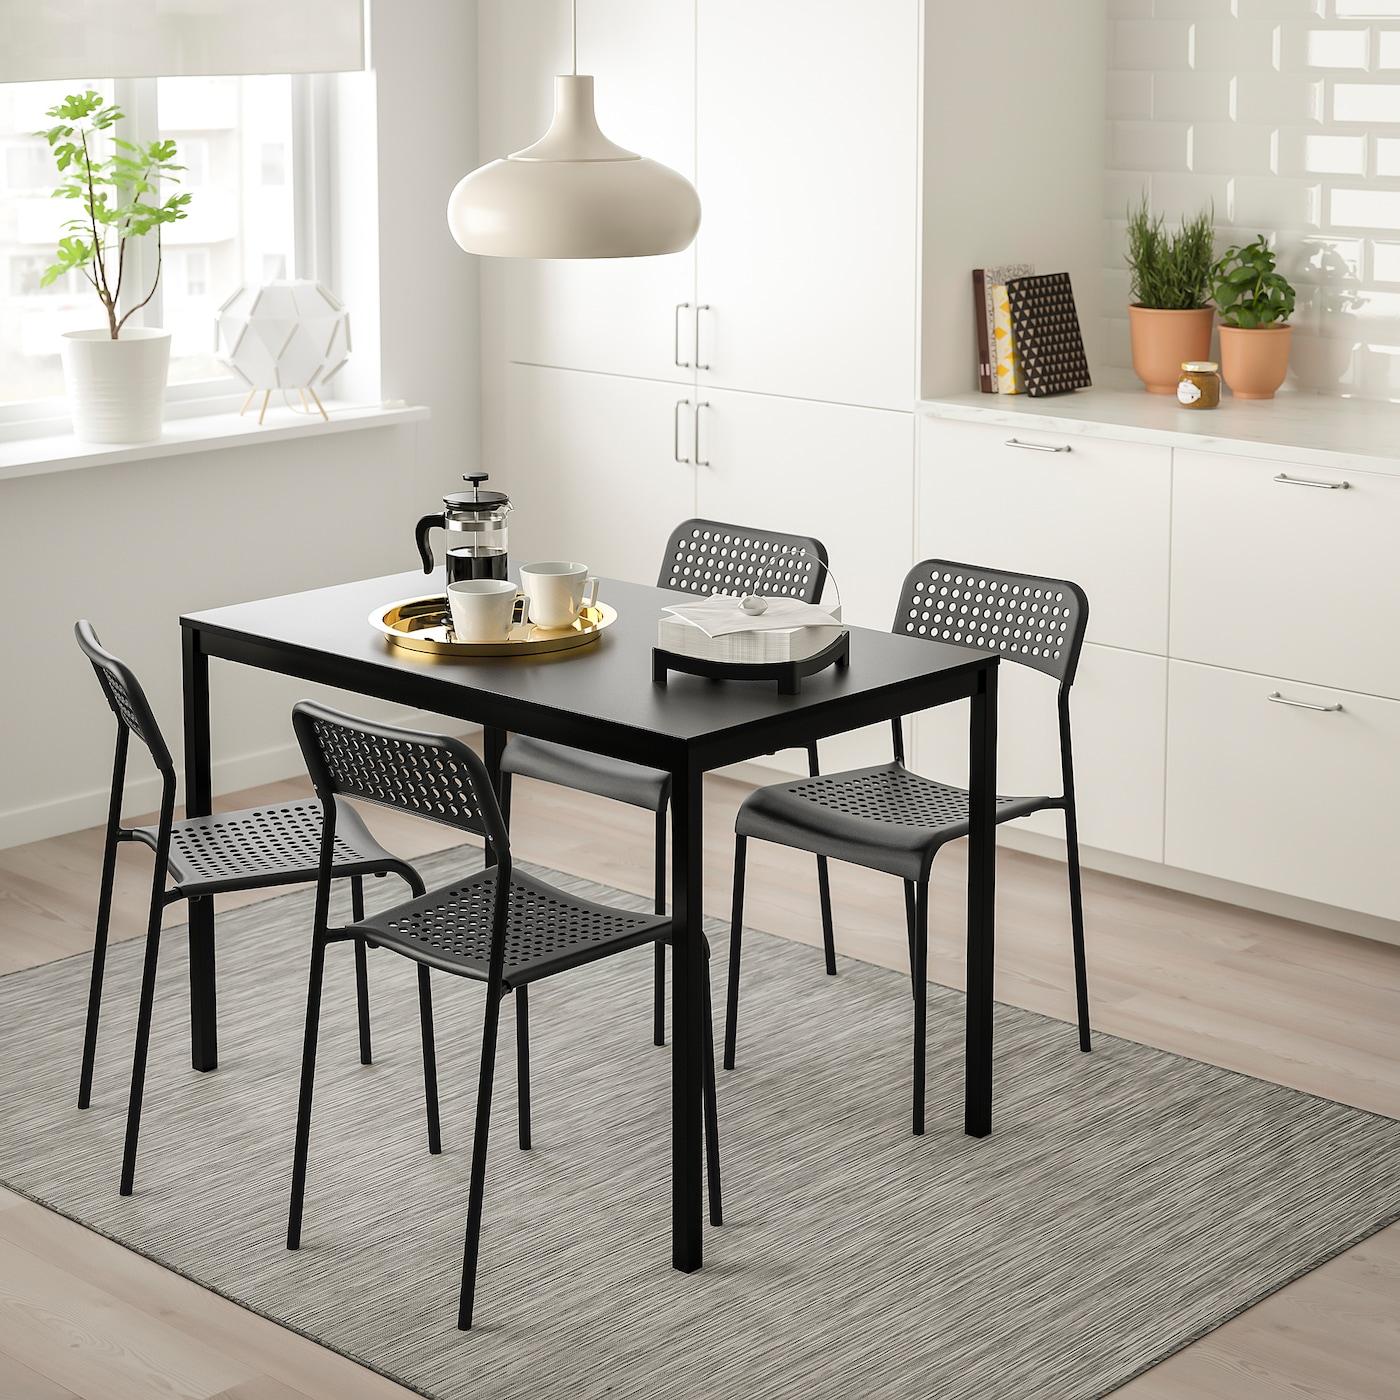 Tarendo Adde Table And 4 Chairs Black Black Ikea